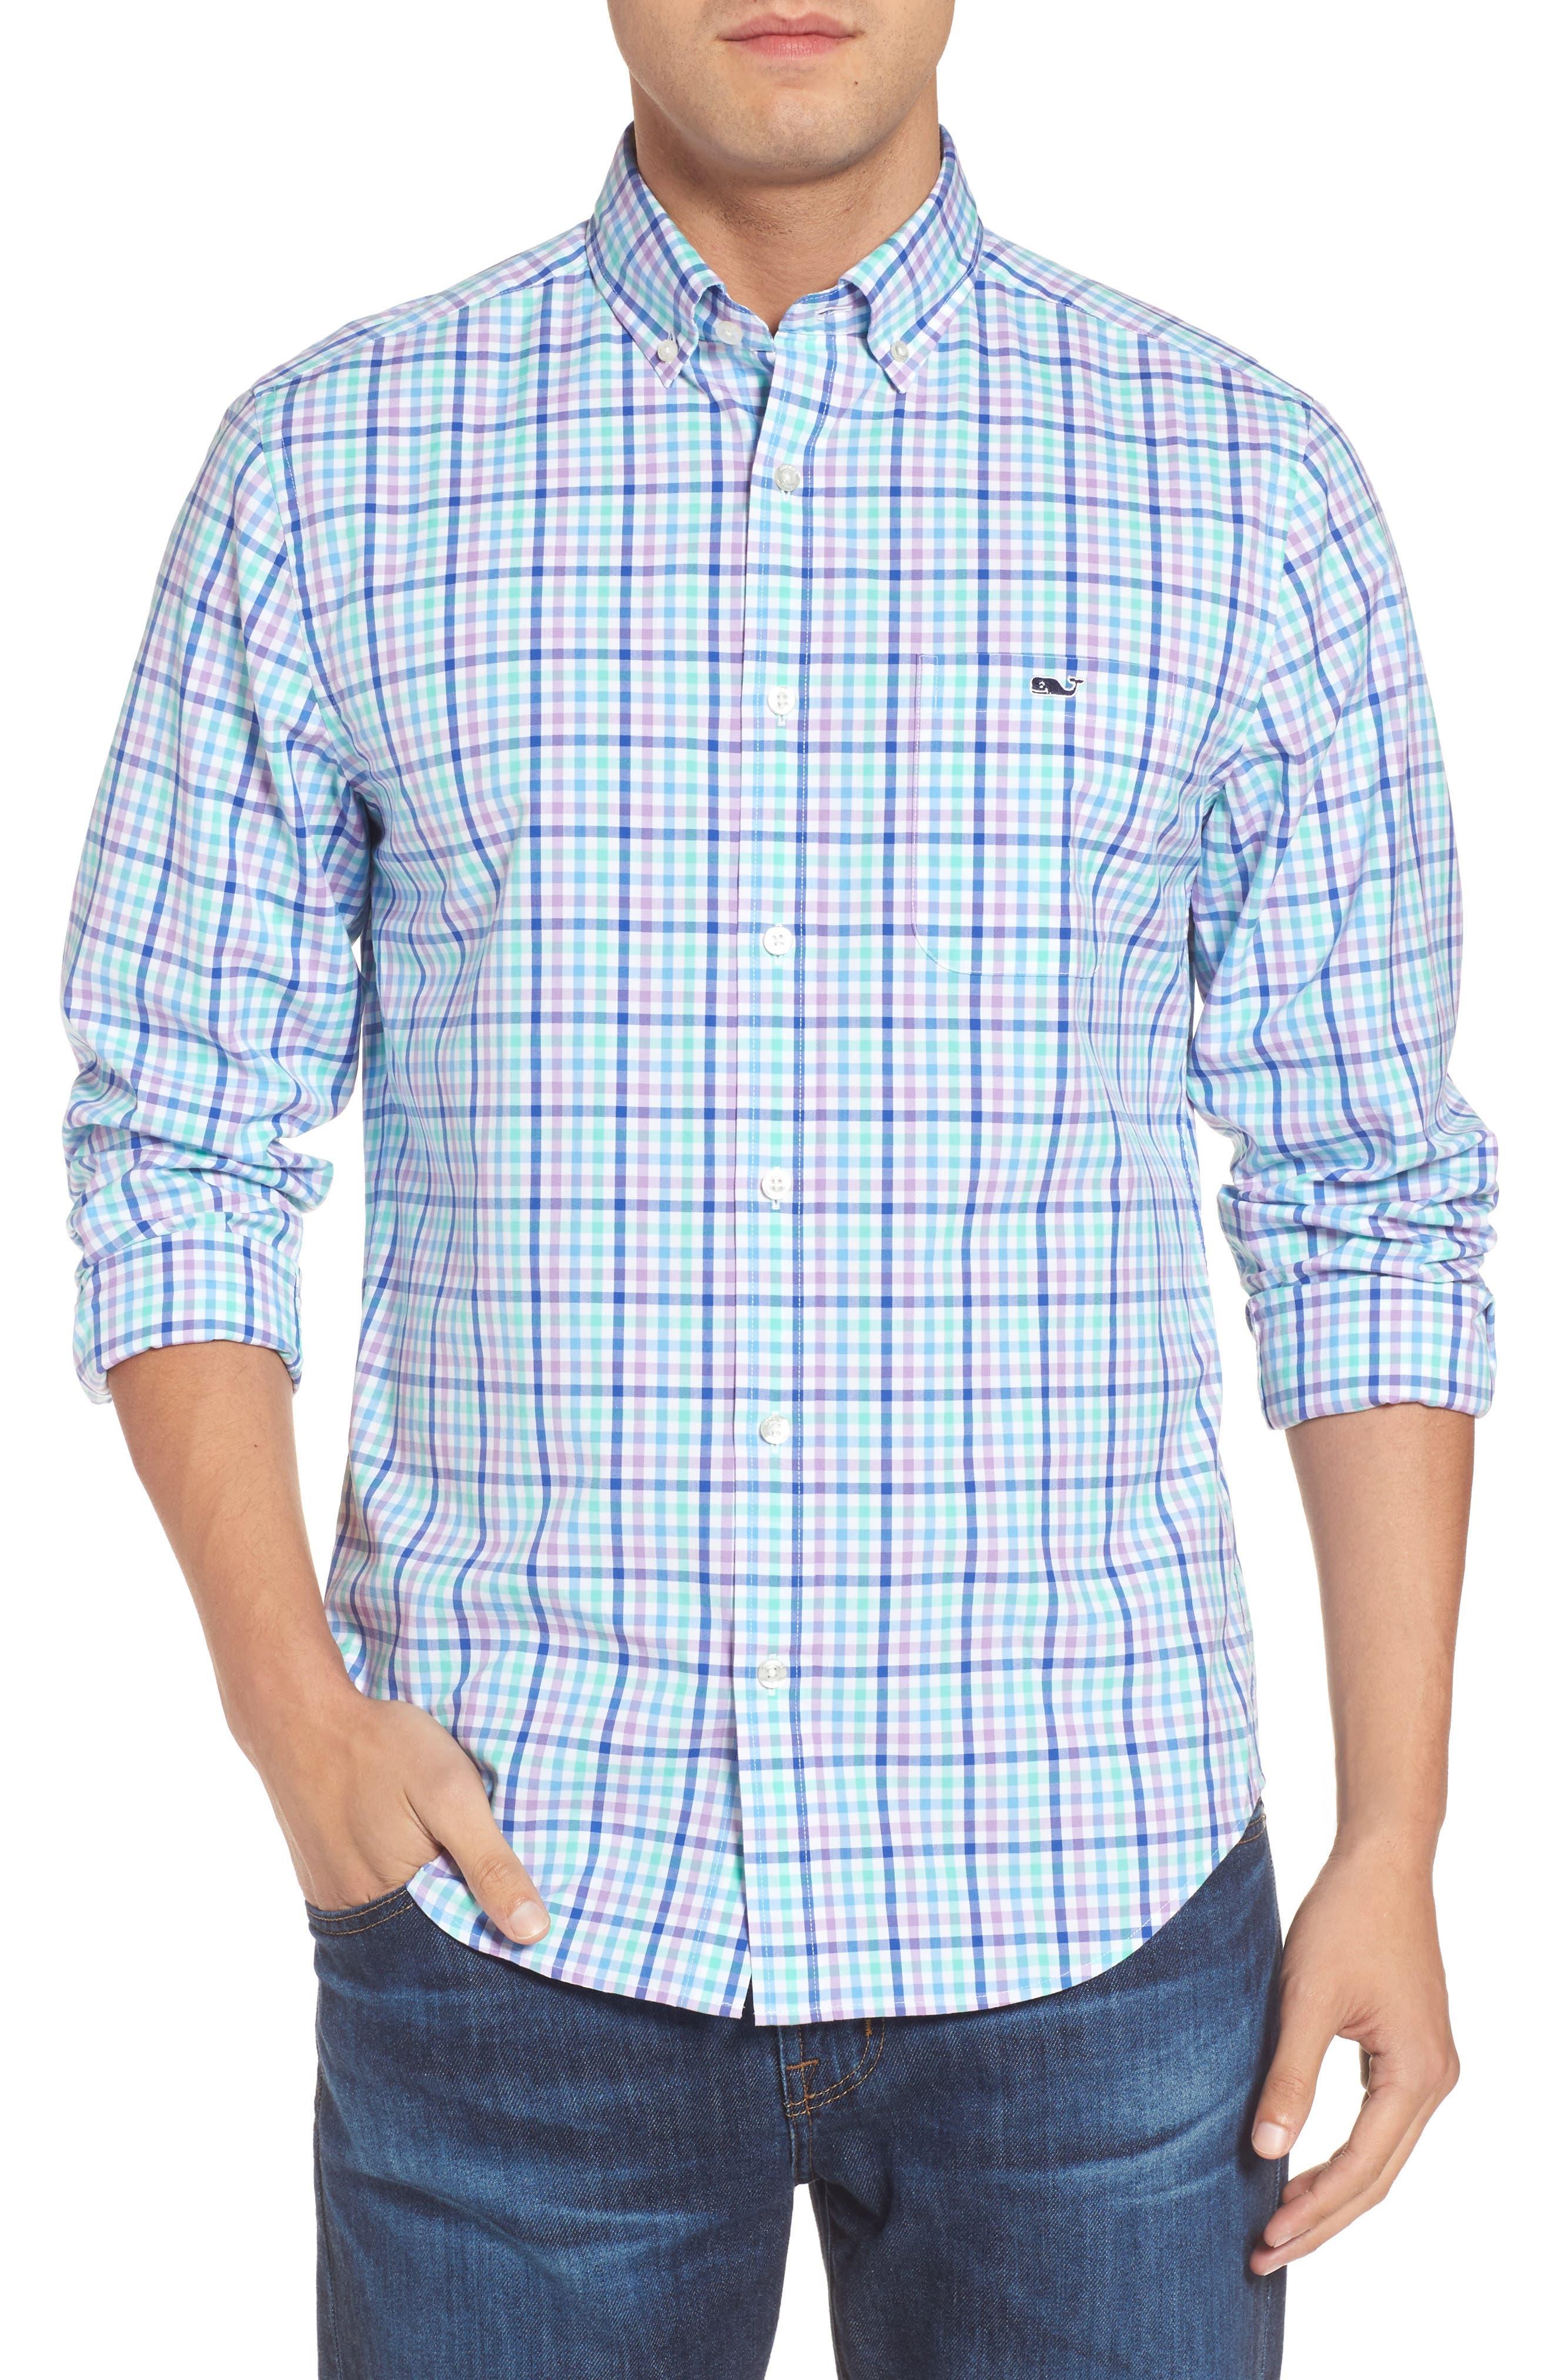 VINEYARD VINES,                             Tucker Gaspar Classic Fit Gingham Sport Shirt,                             Main thumbnail 1, color,                             359